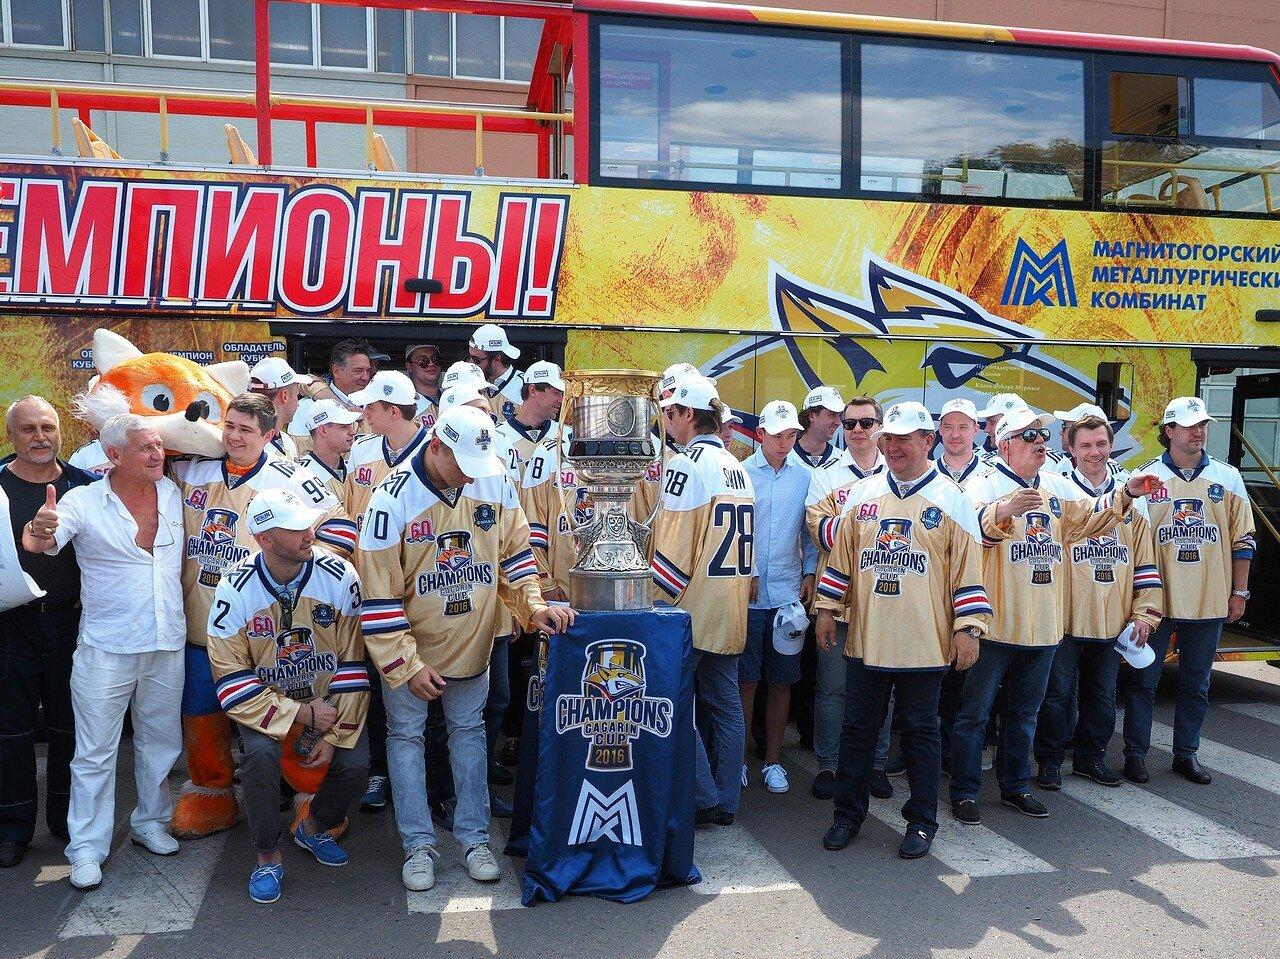 153Церемония чествования команды Металлург27.05.2016